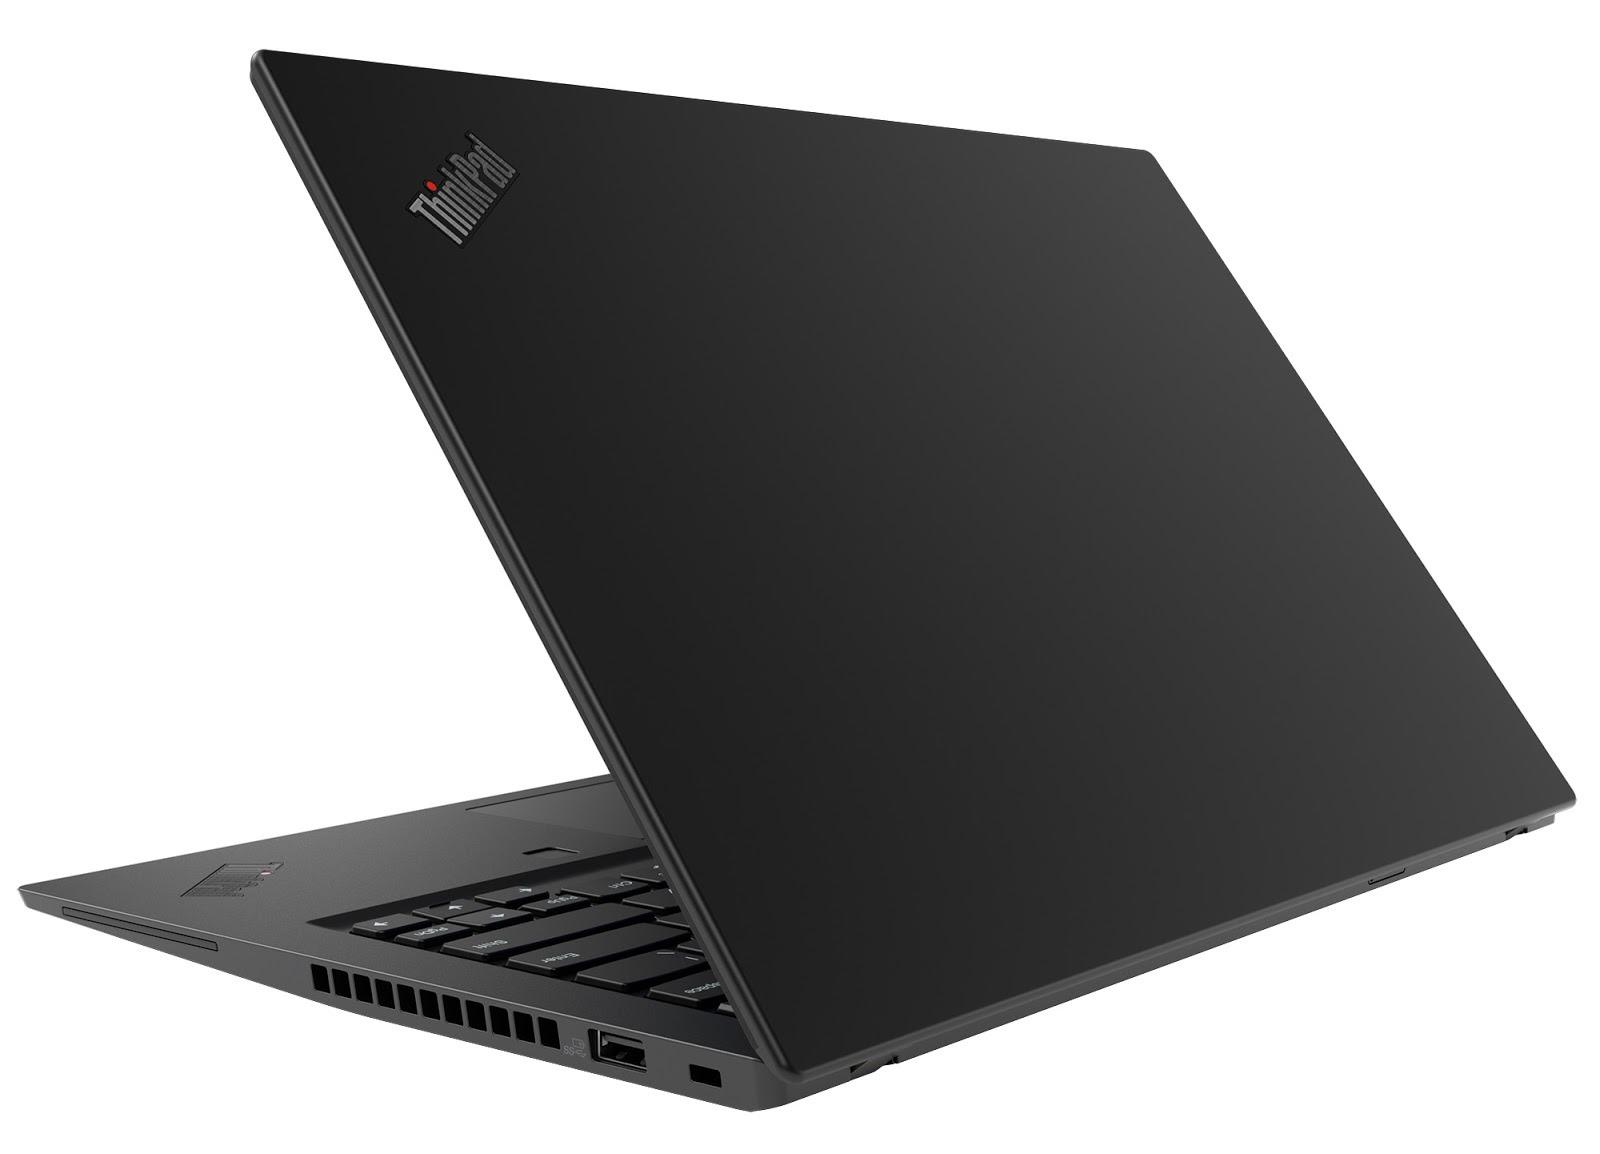 Фото 2. Ноутбук Lenovo ThinkPad T14s Gen 1 Black (20UH001JRT)